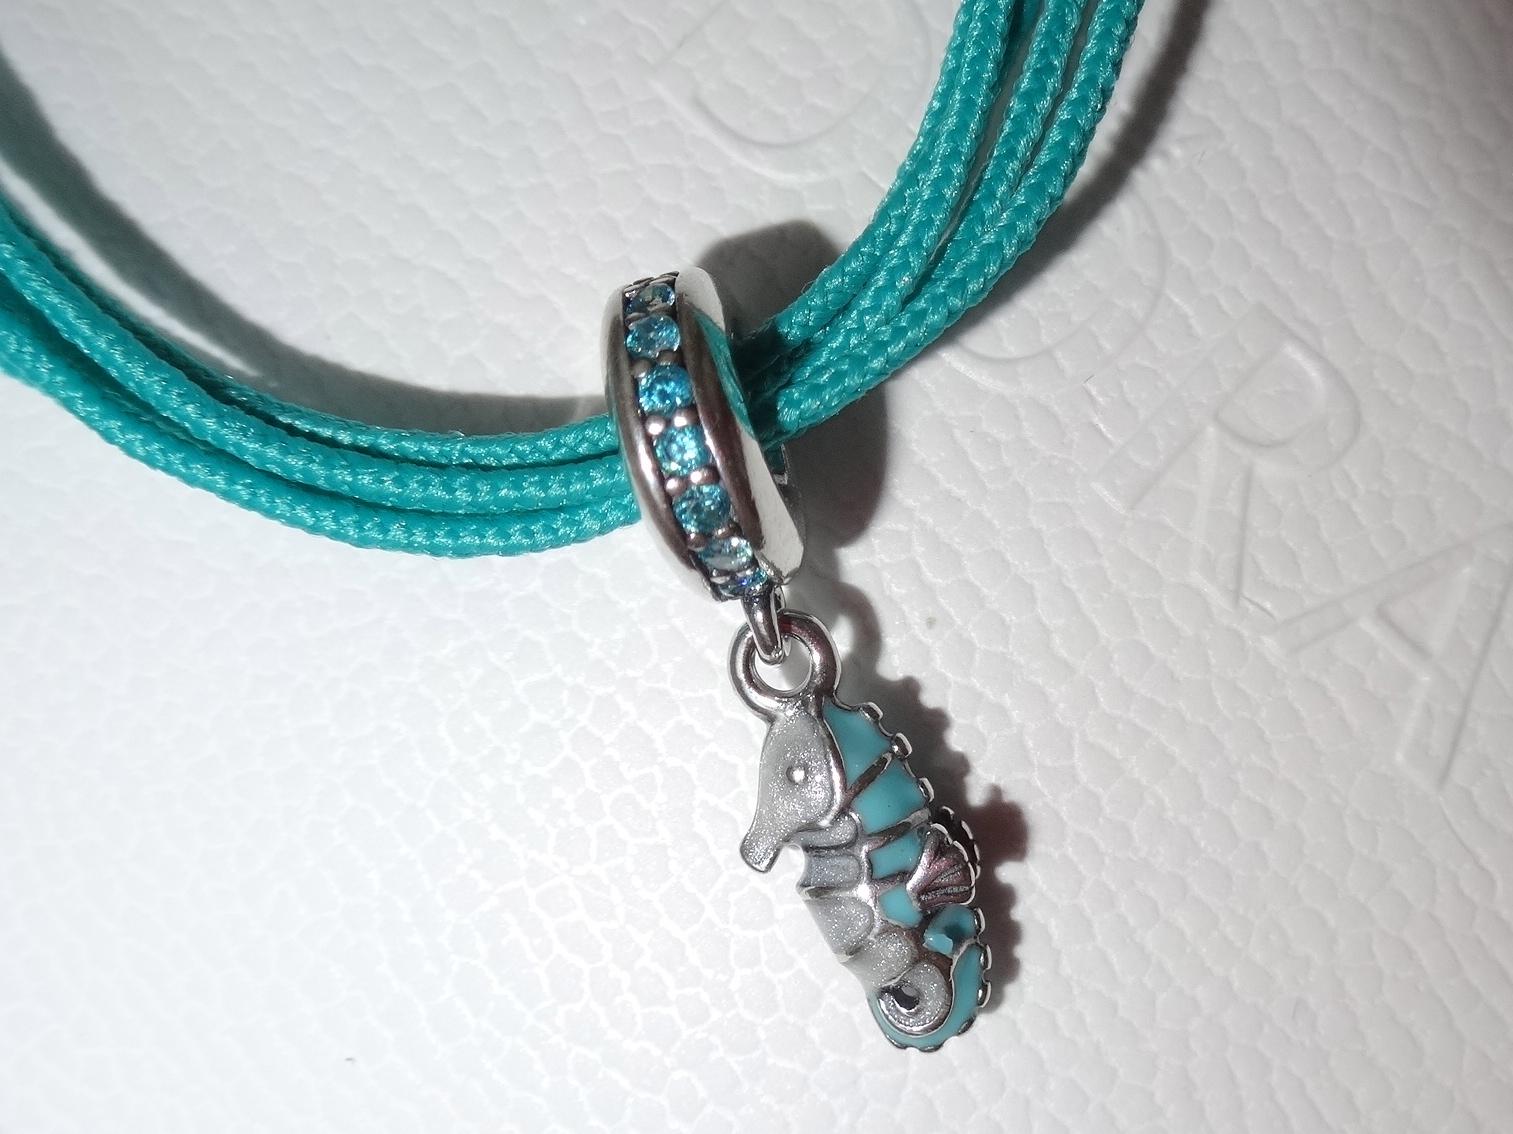 Pandora dangling charm